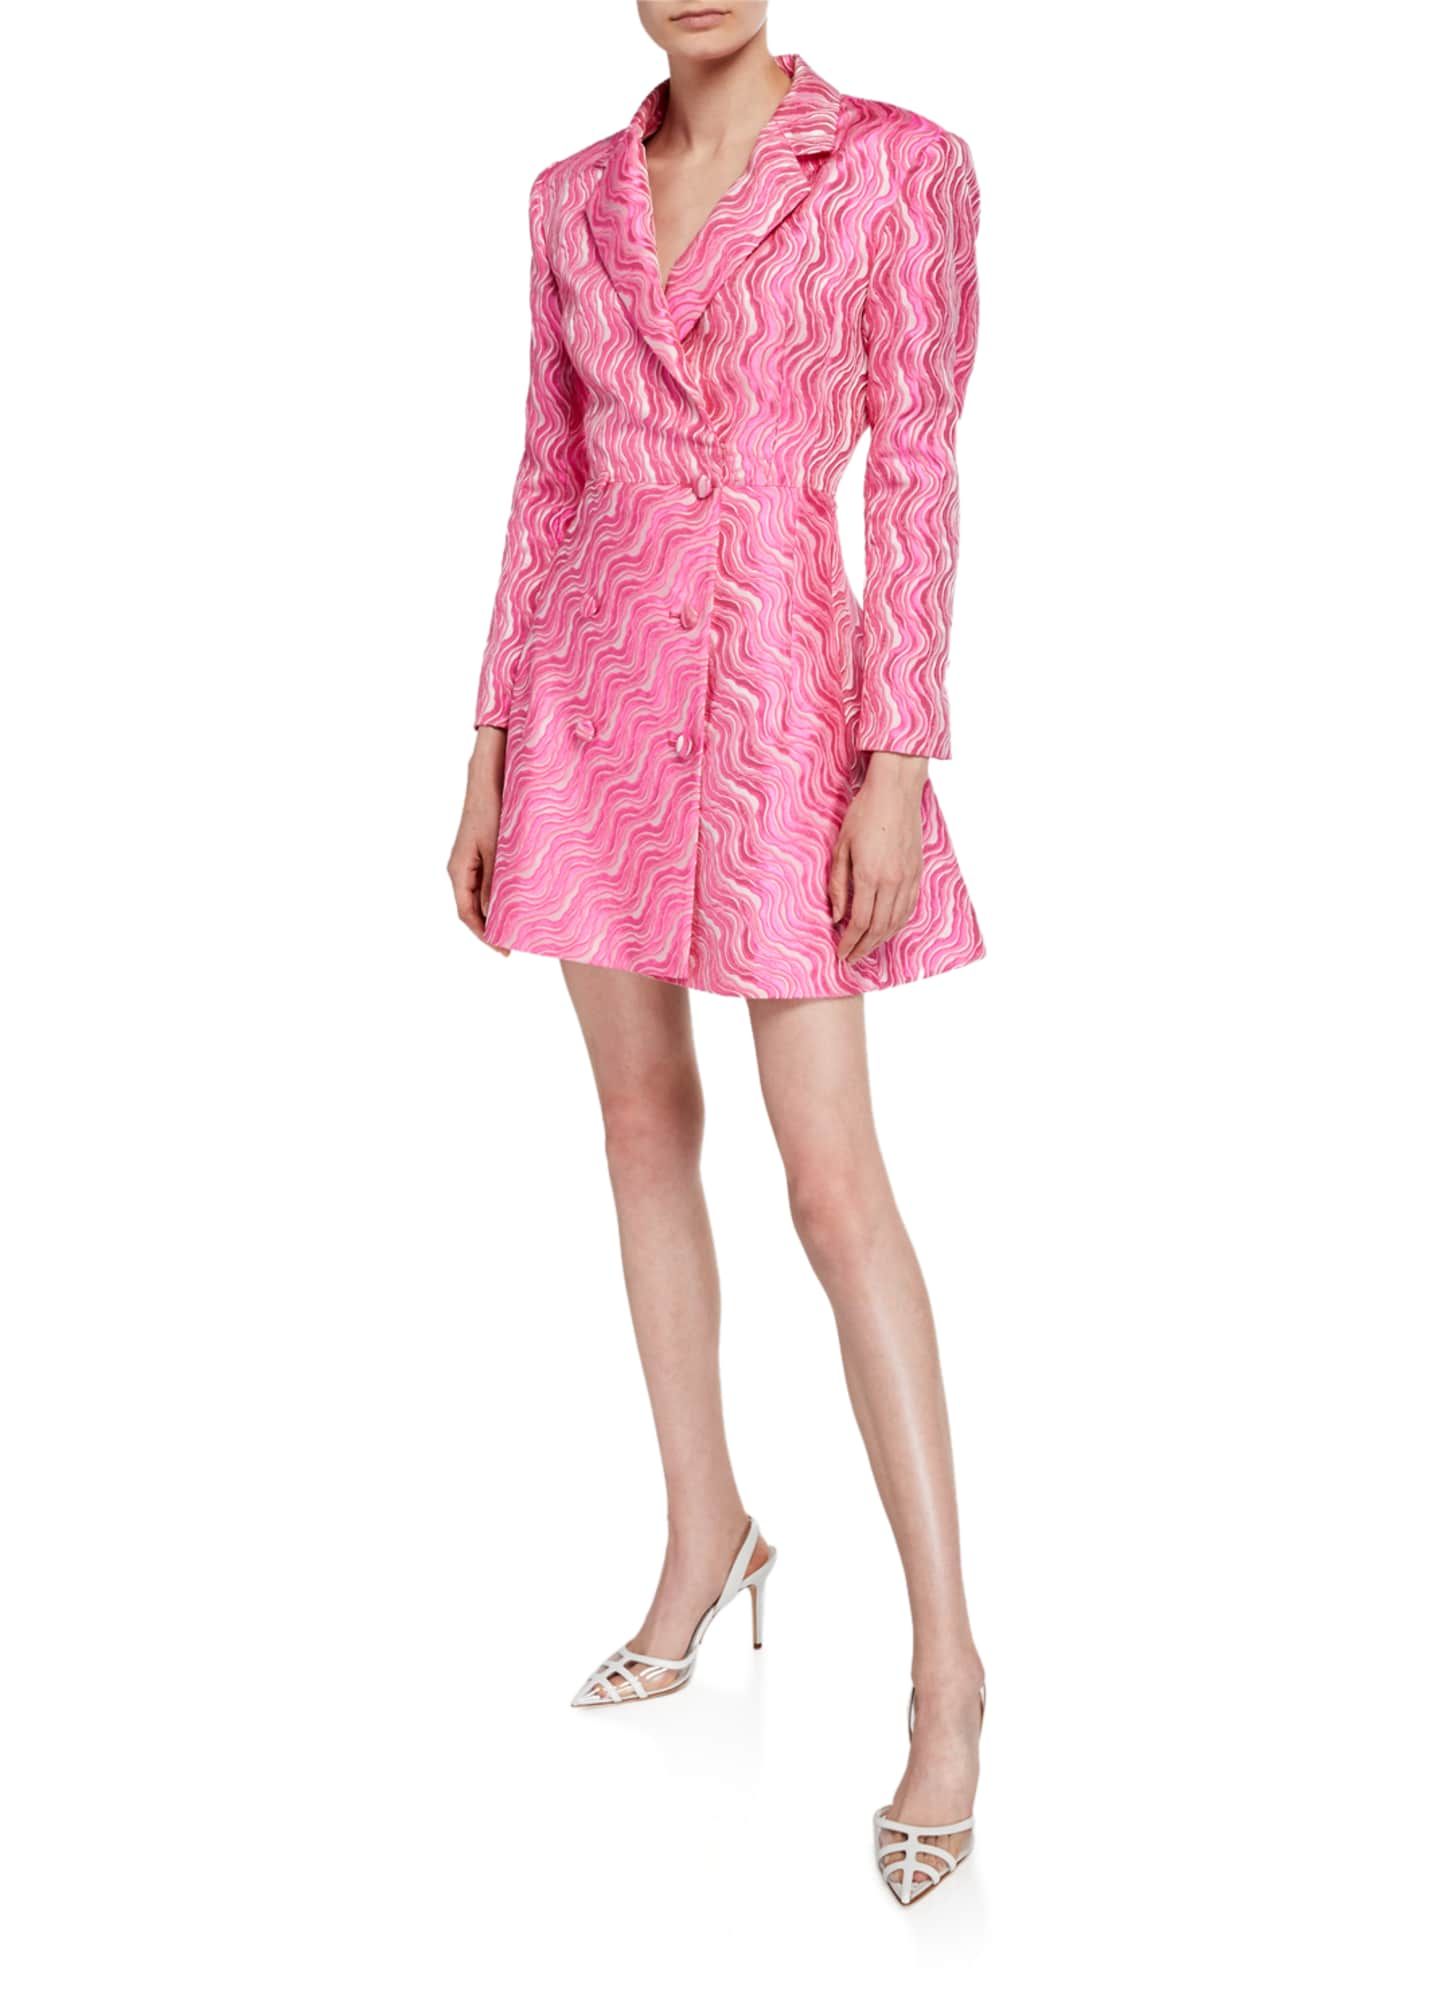 Rotate Birger Christensen Double-Breasted Jacquard Short Dress